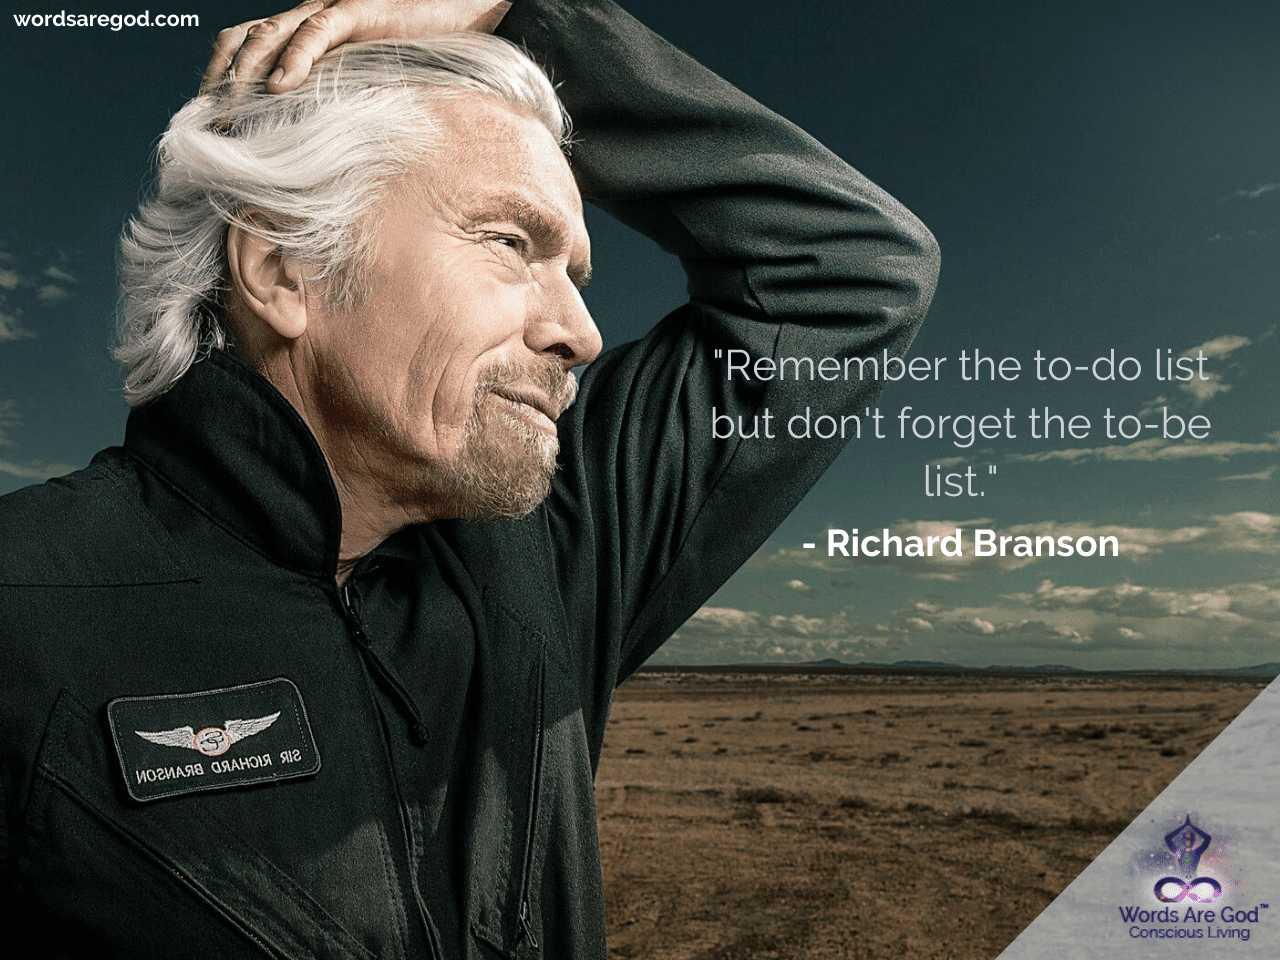 Richard Branson Inspirational Quote